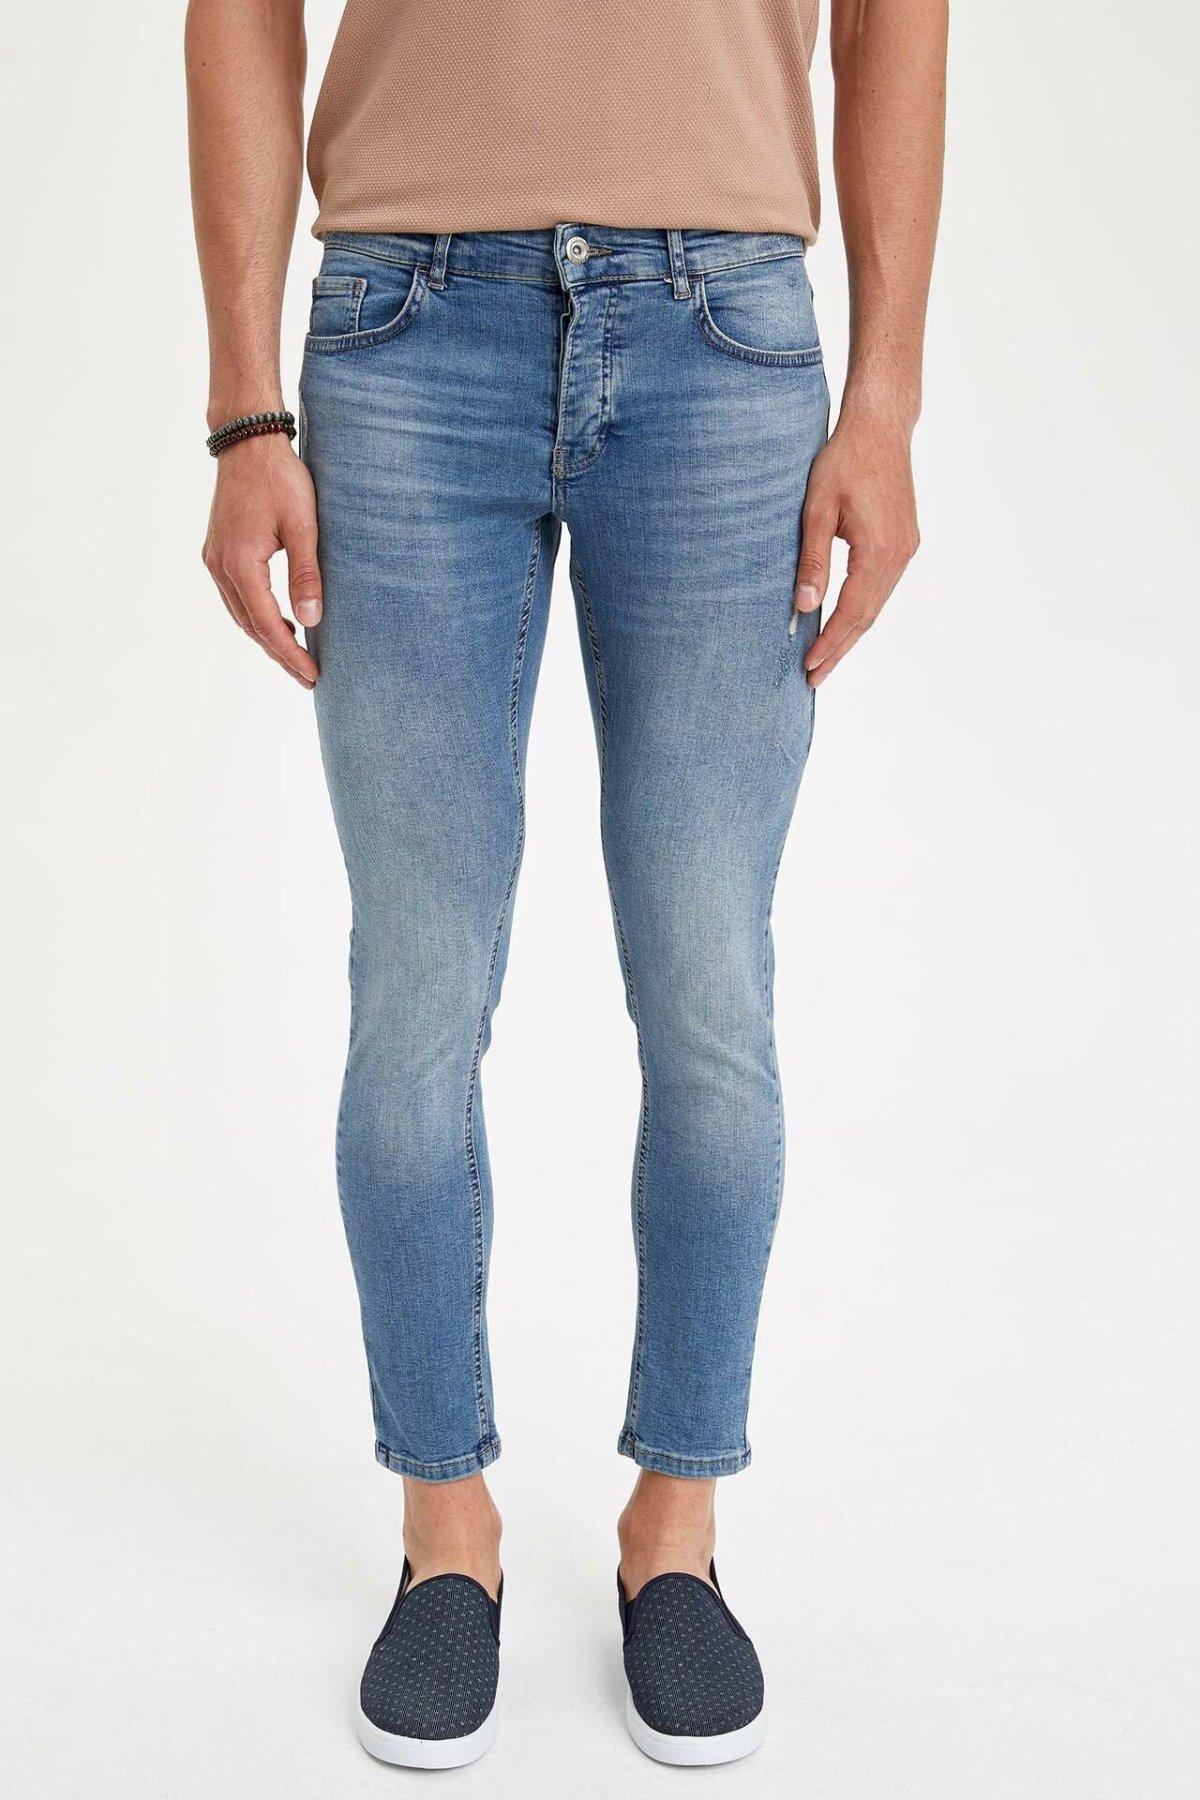 DeFacto Fashion Mens Wash Blue Stretch Jeans Men Elastic Cotton Denim Pants Skinny Trousers New Menswear New -L9472AZ19SM